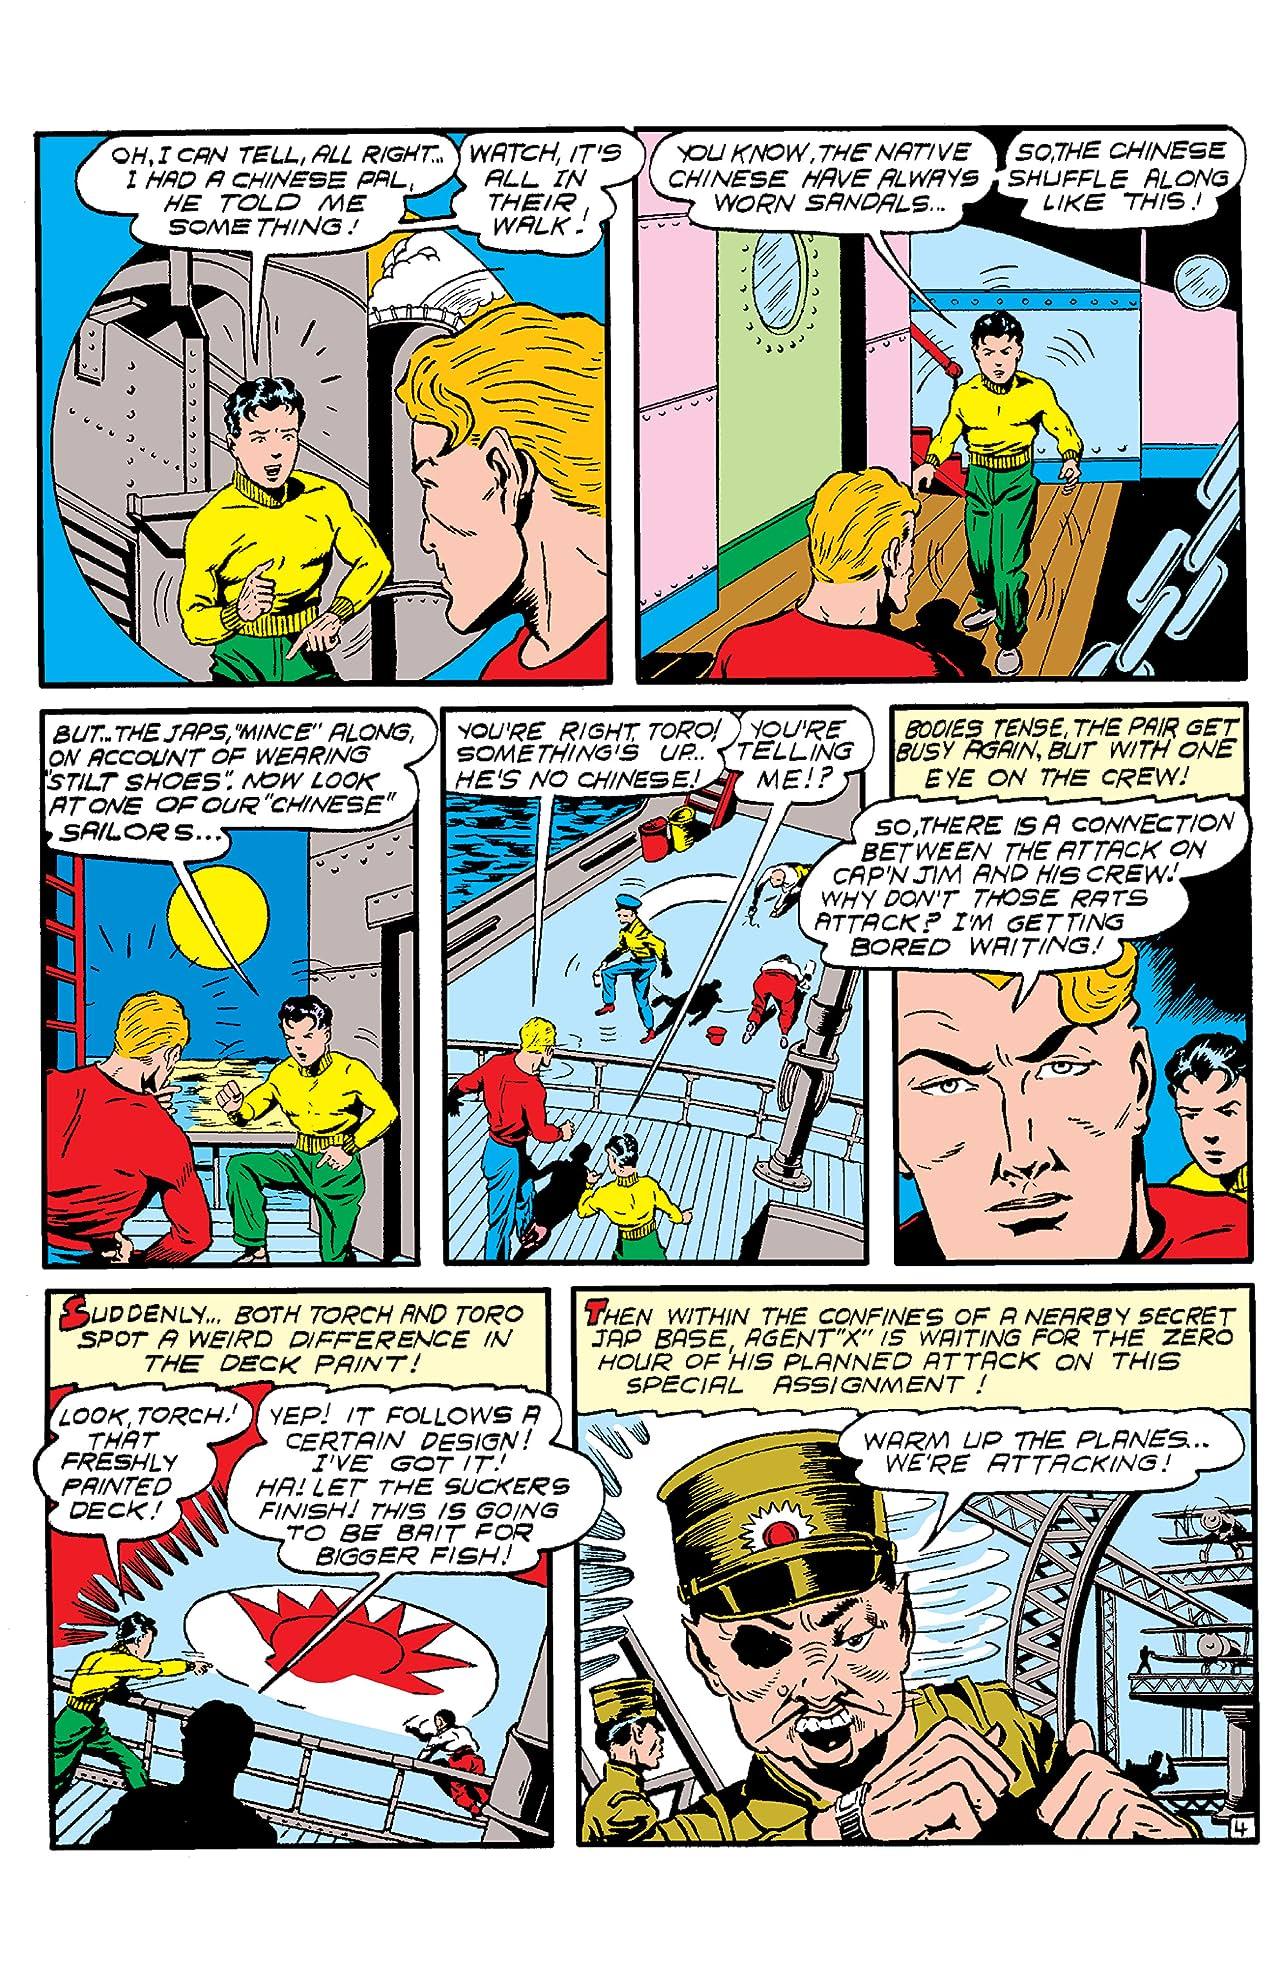 Human Torch (1940-1954) #7